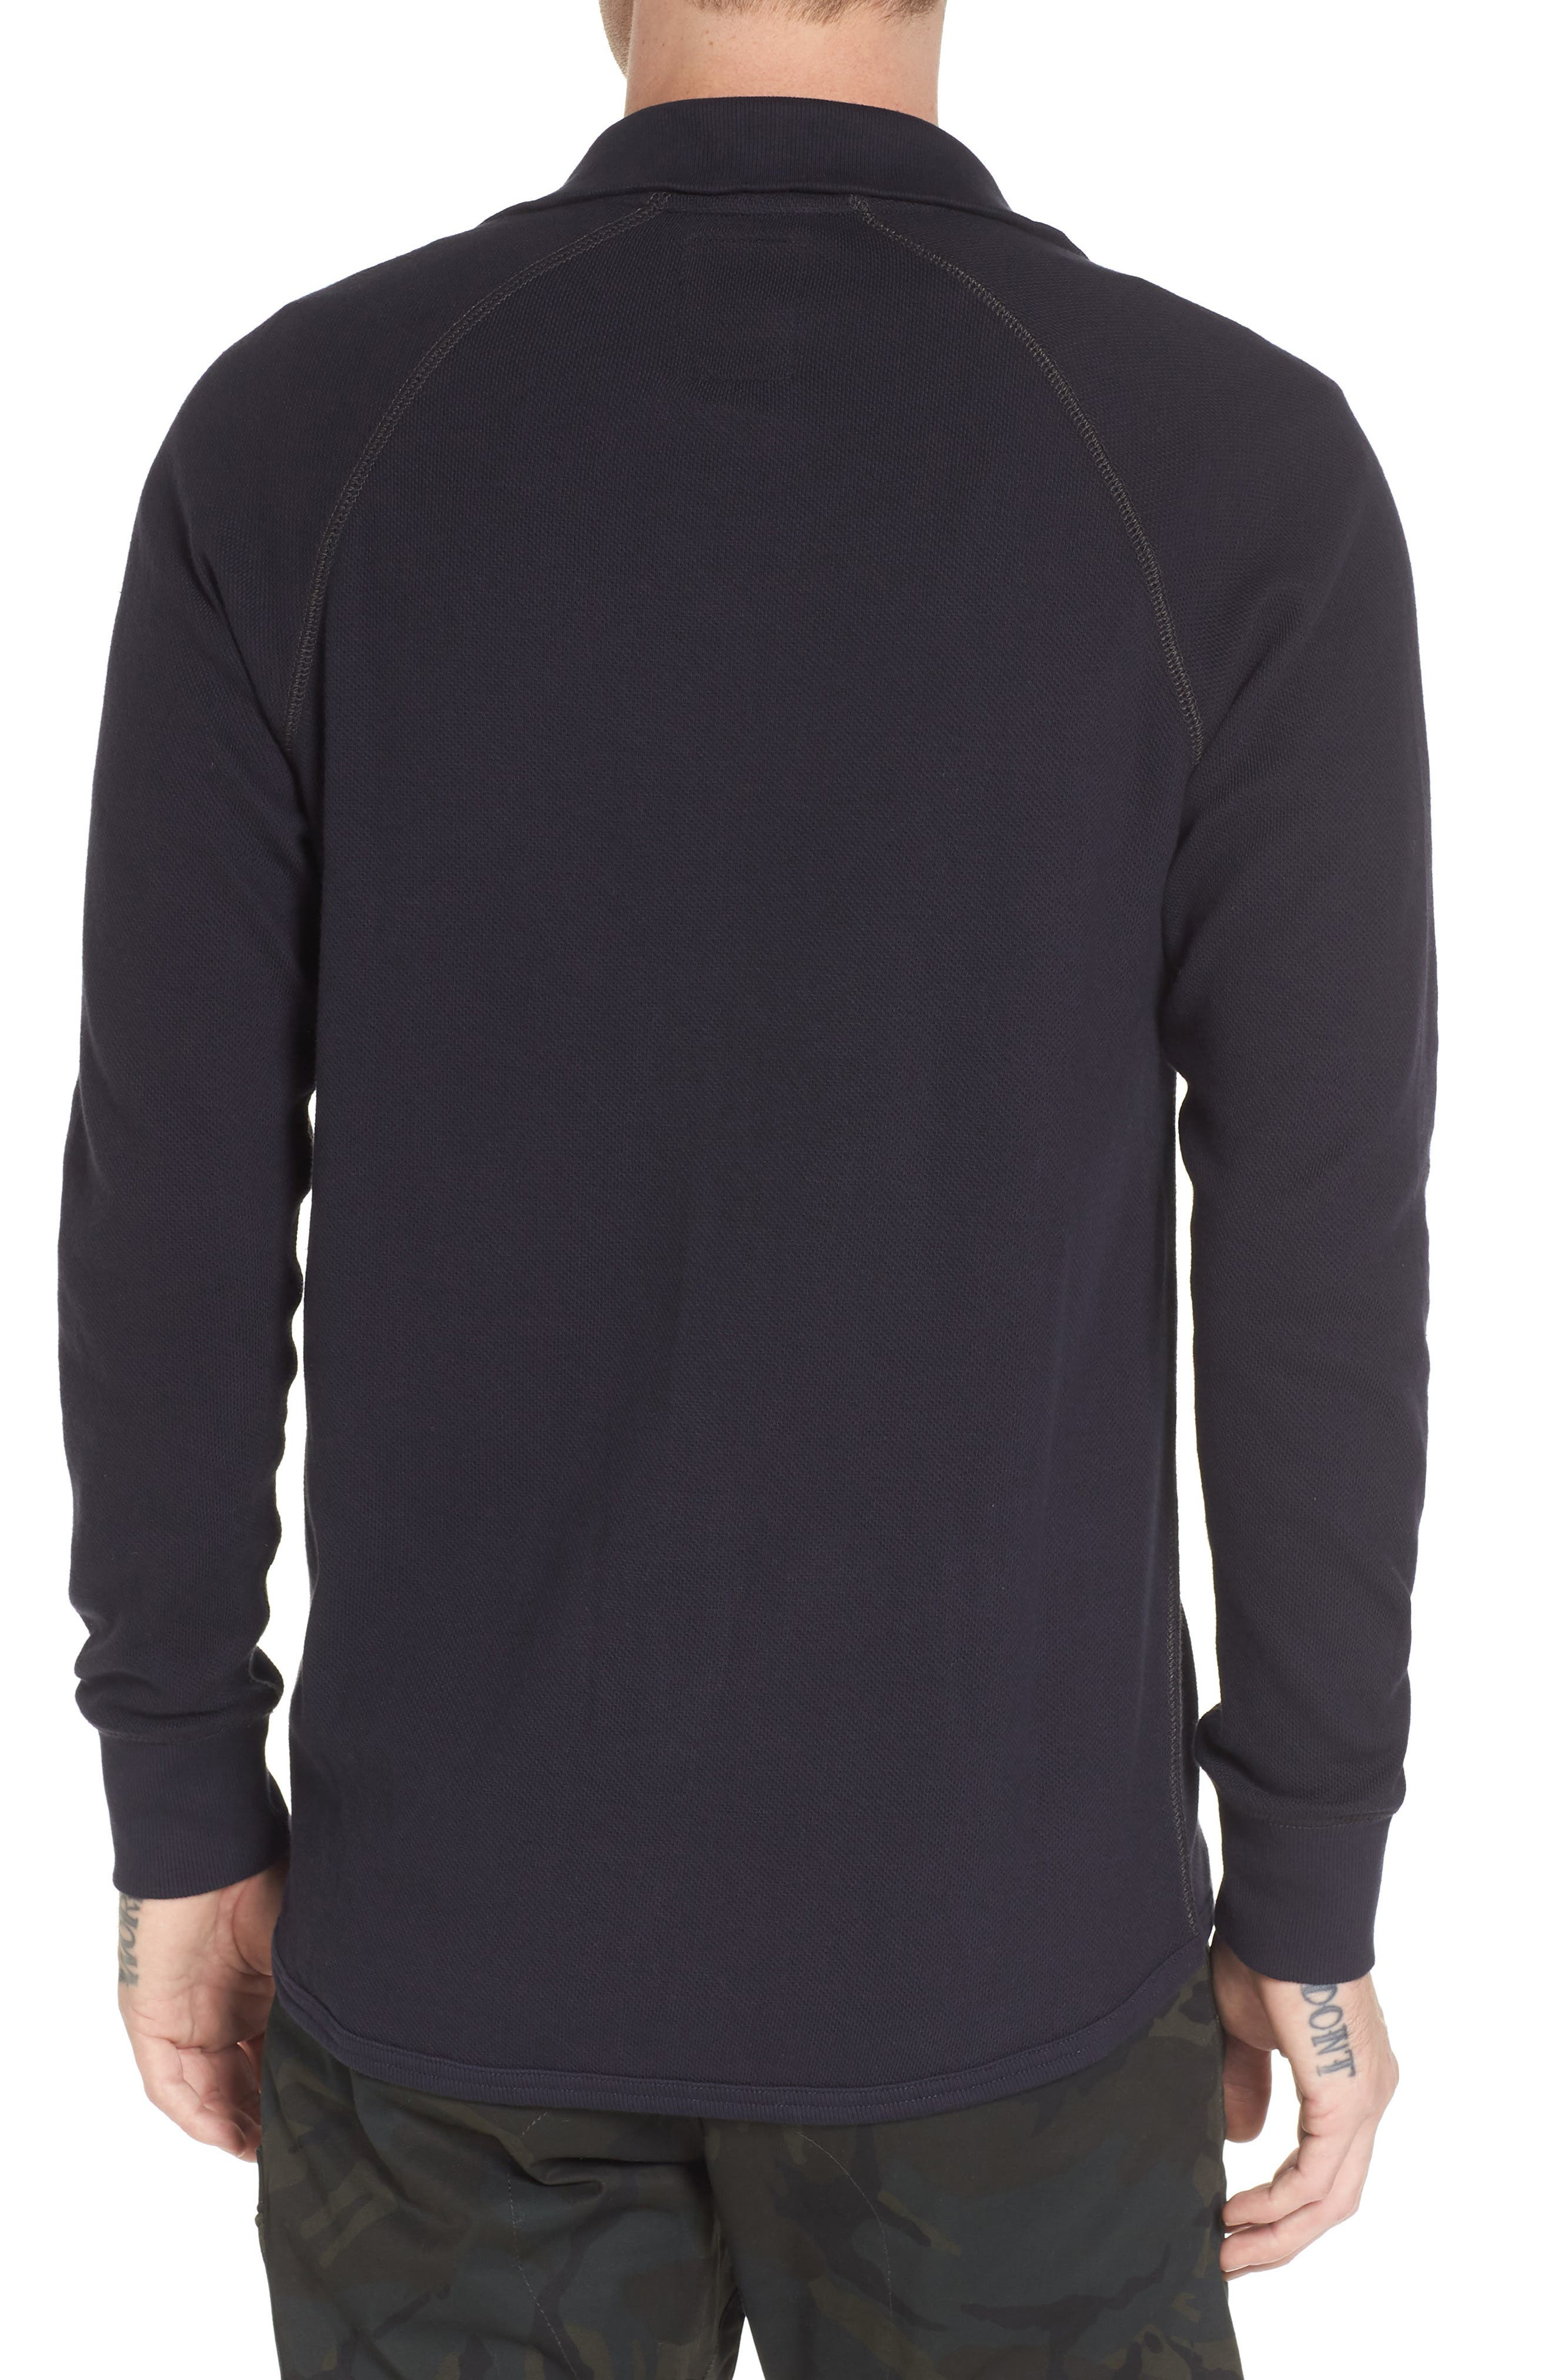 Jirgi Front Zip Sweater,                             Alternate thumbnail 2, color,                             400